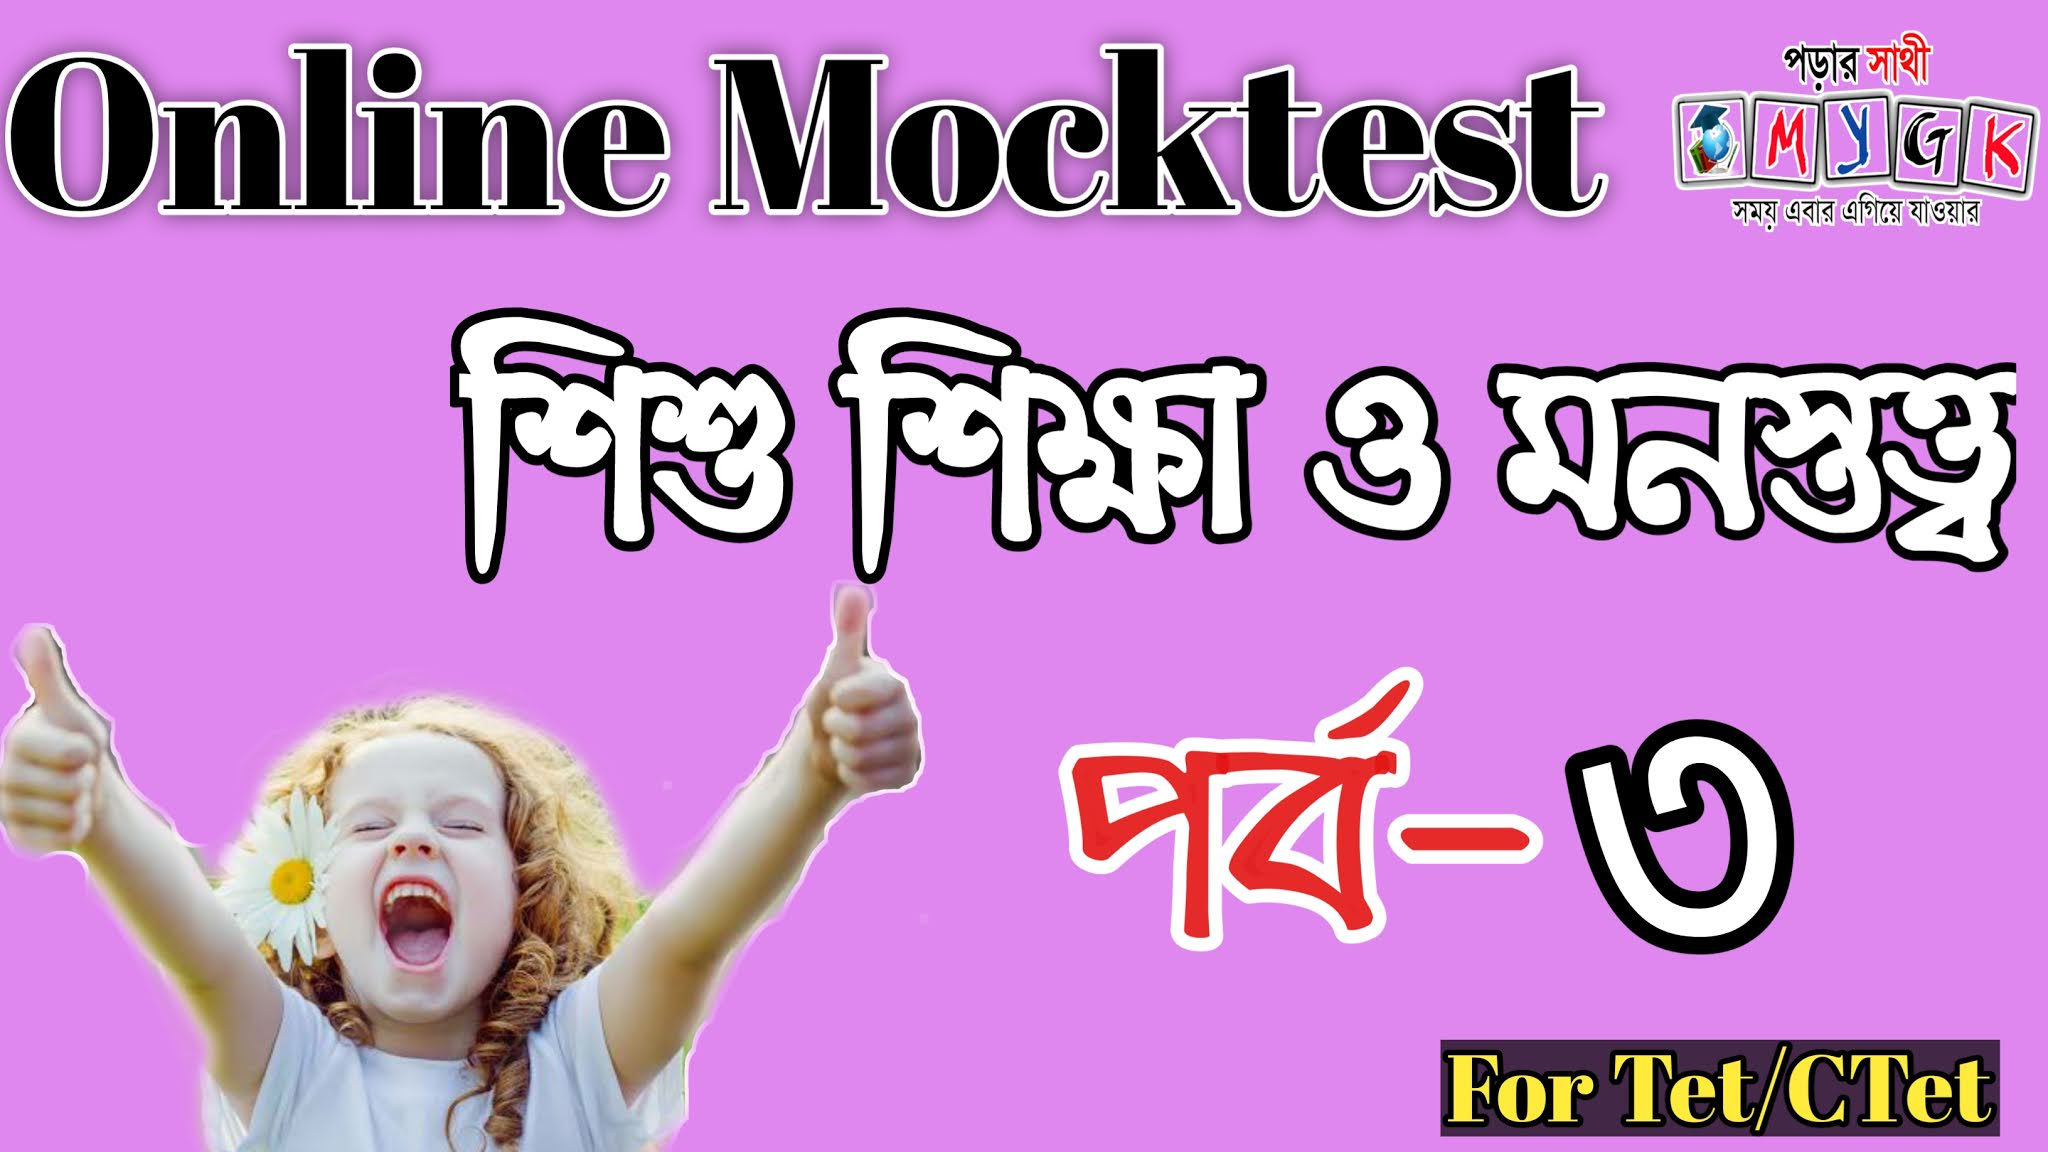 Online Mocktest On Child Study And Pedagogy In Bengali For Primary Tet/Ctet Exam -(Part-3) || শিশুশিক্ষা ও শিশুমনস্তত্ত্ব অনলাইন মকটেস্ট - প্রাথমিক টেট